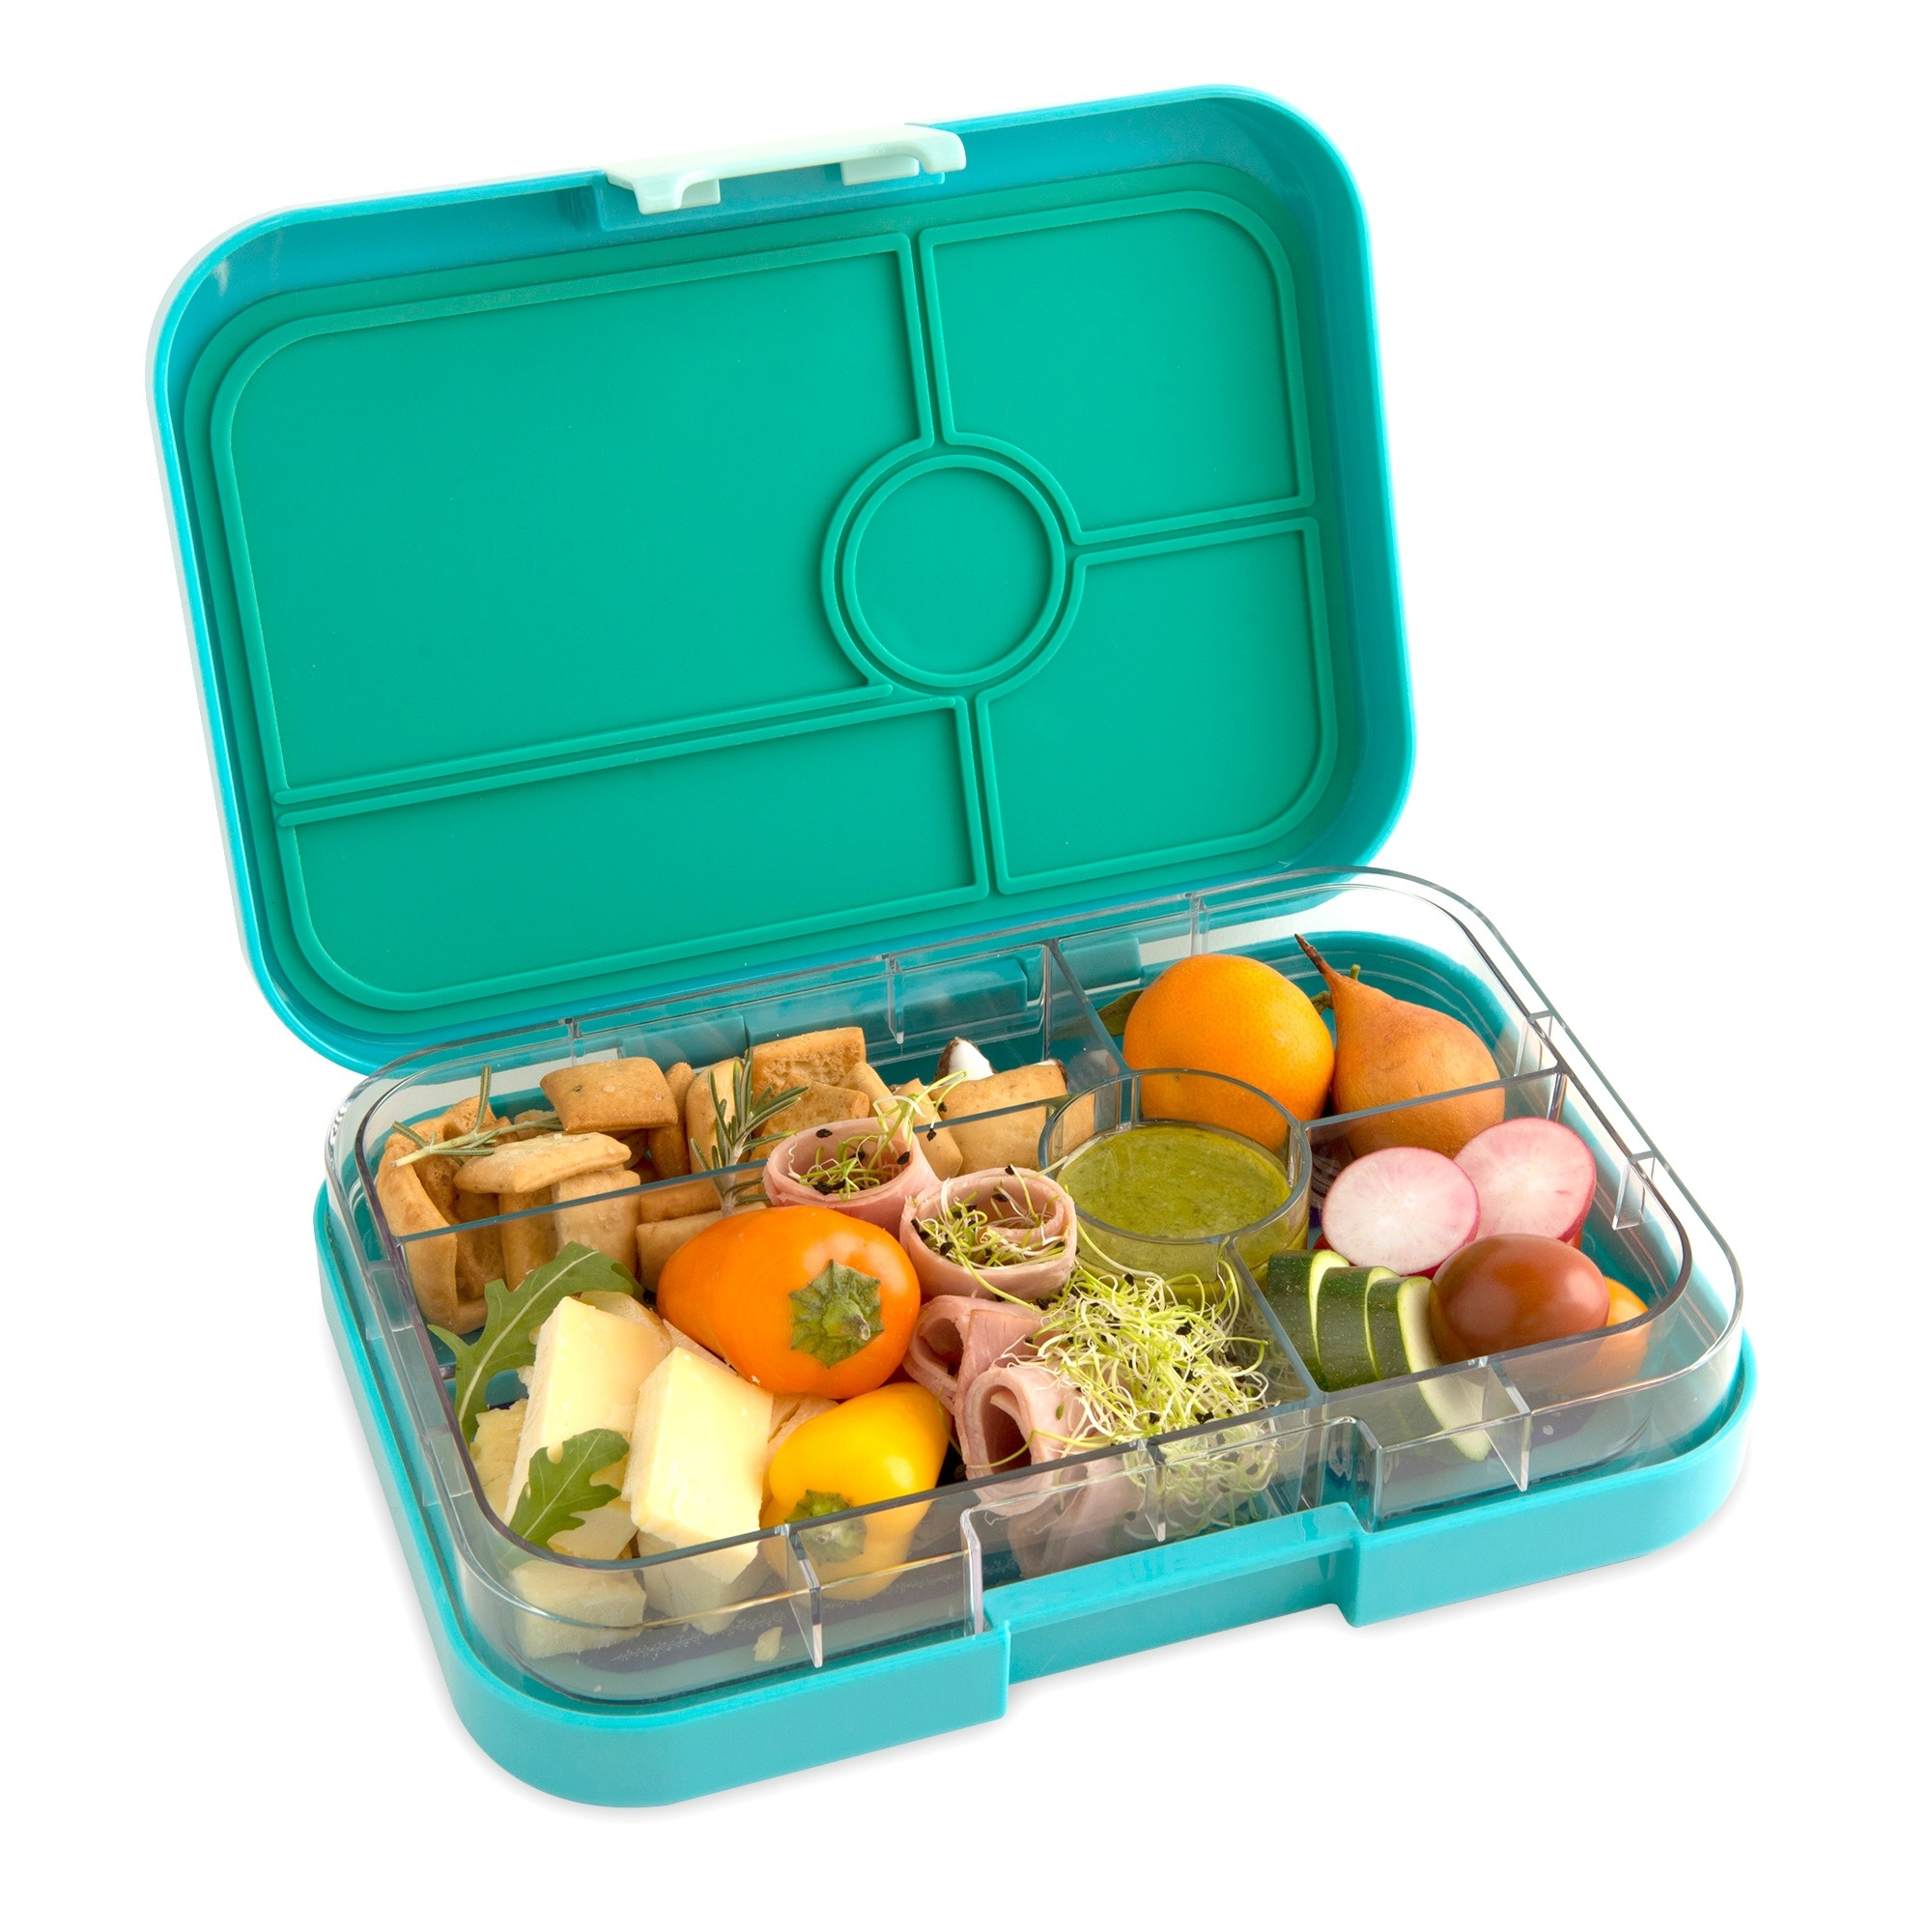 Yumbox Tapas XL broodtrommel Antibes blauw / Bon appetit tray 5 vakken-2